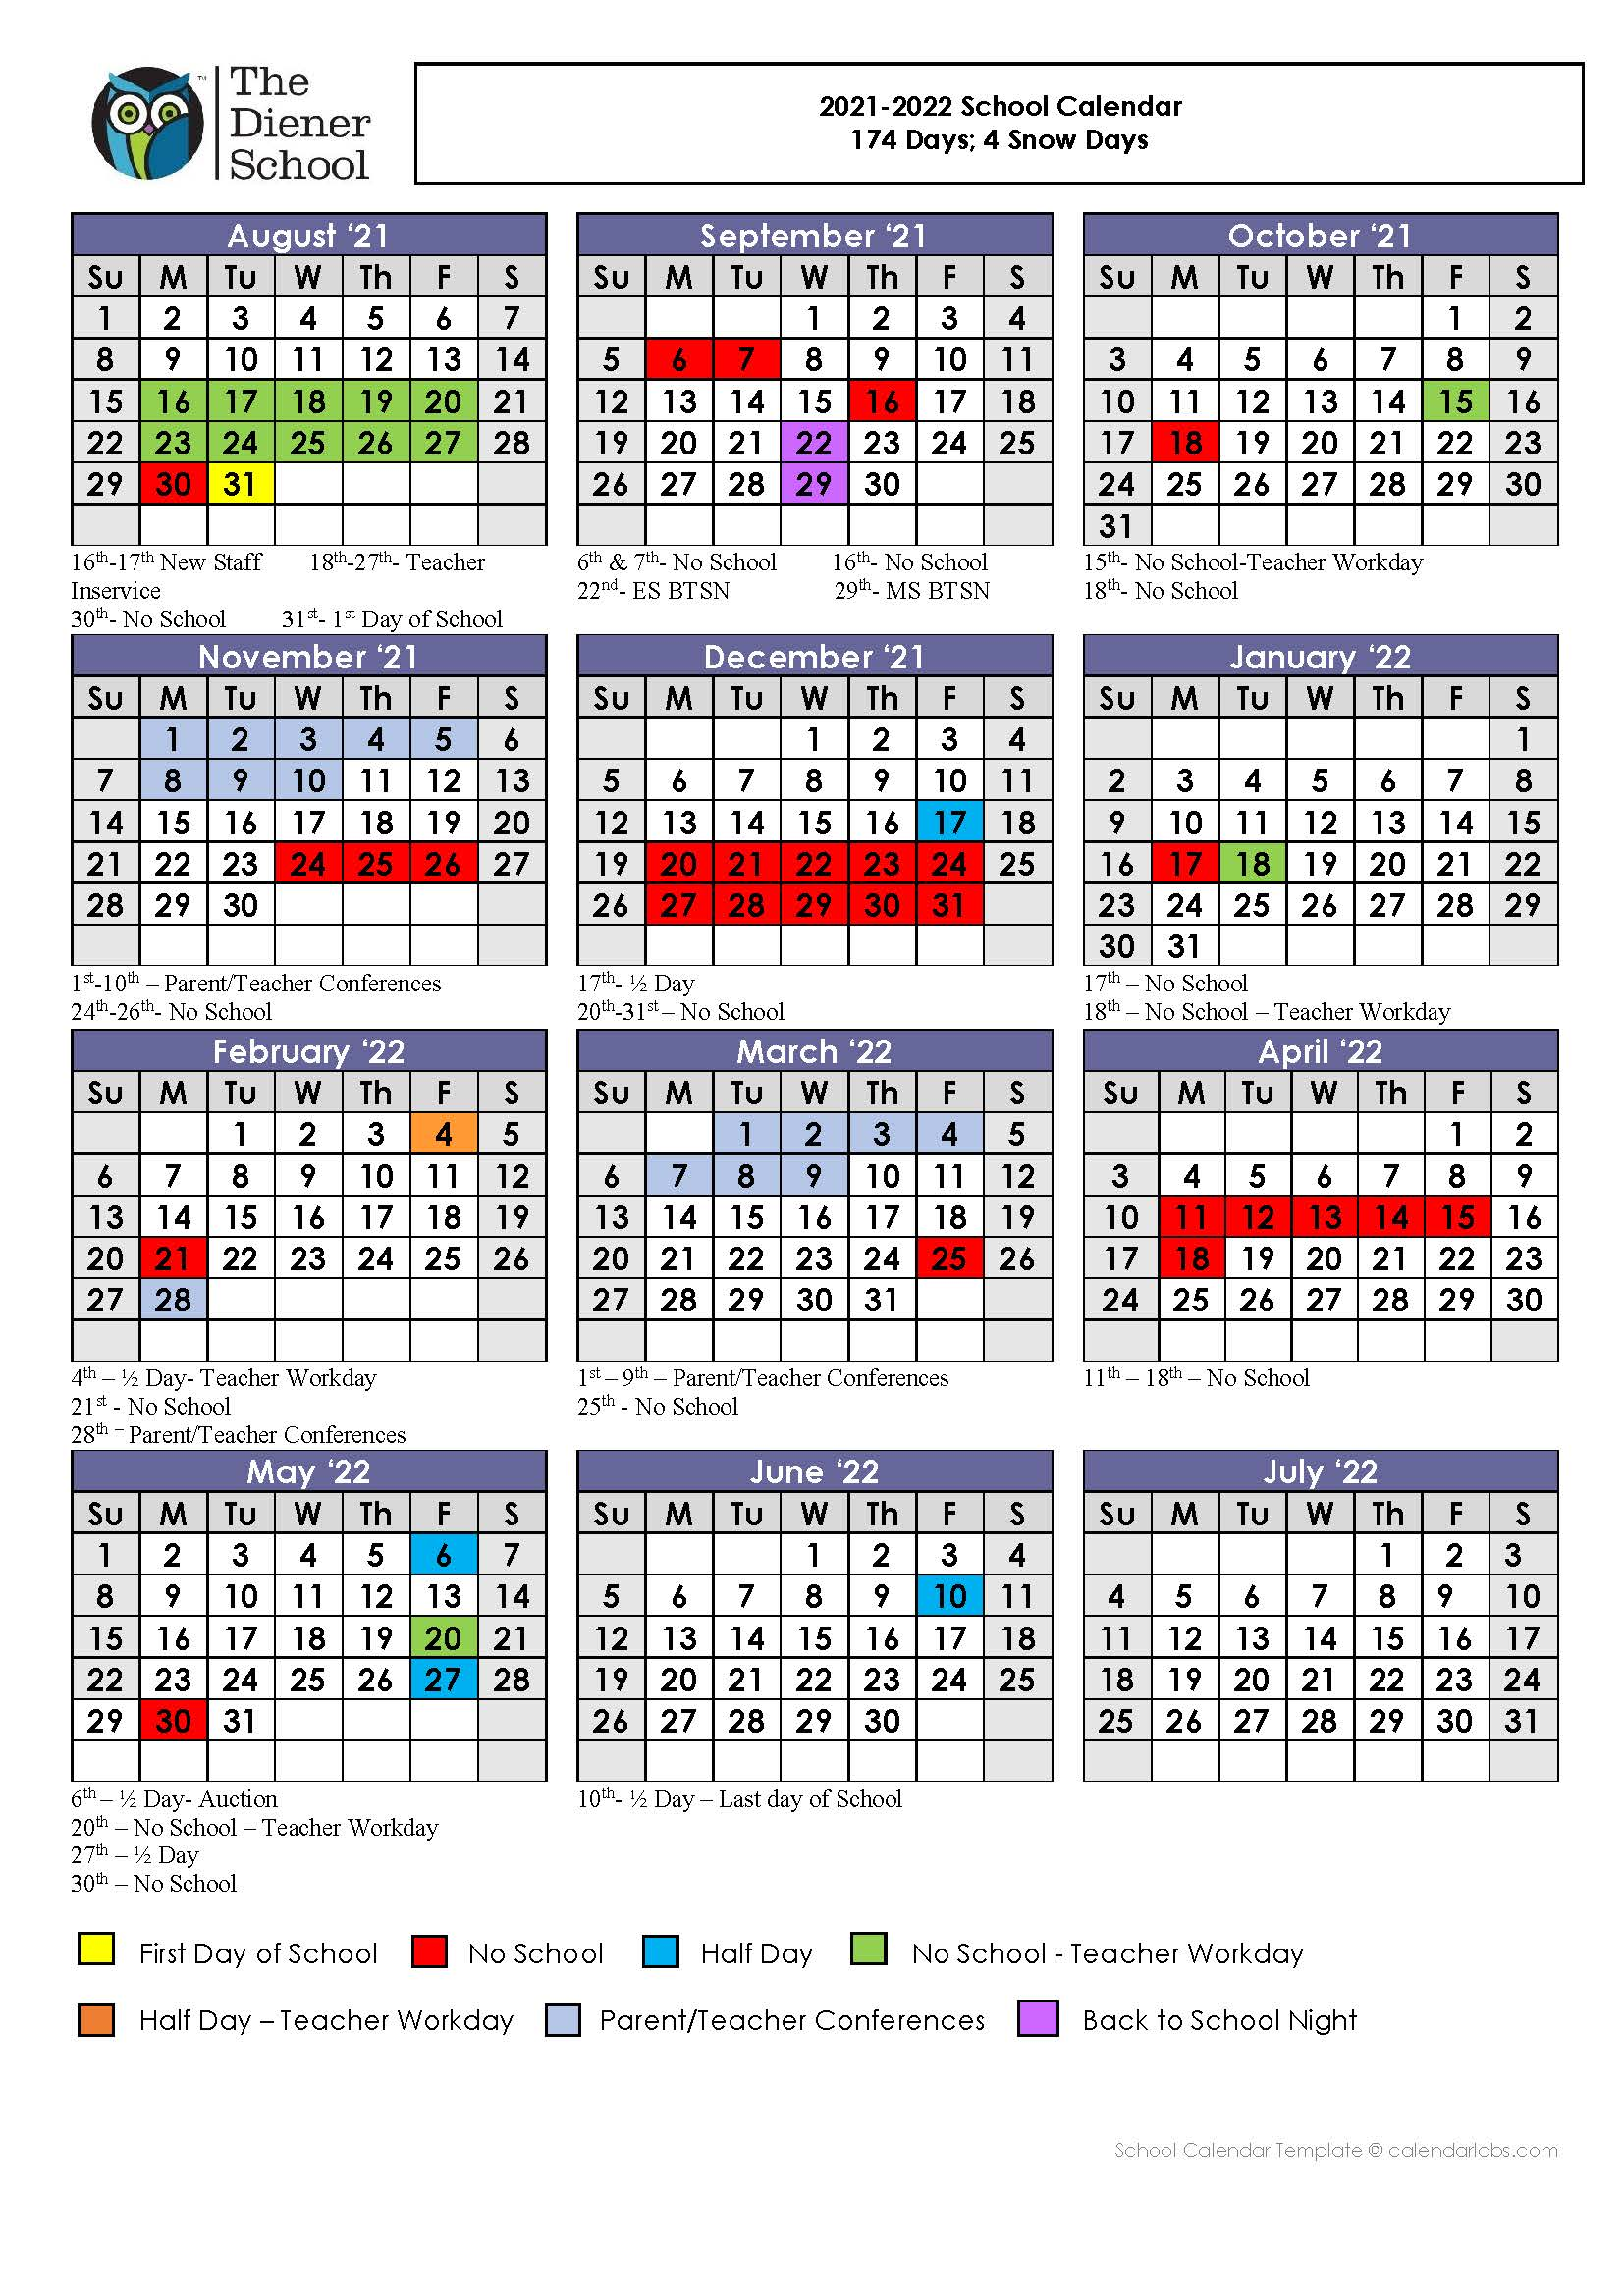 The Diener School Calendar 2021-2022